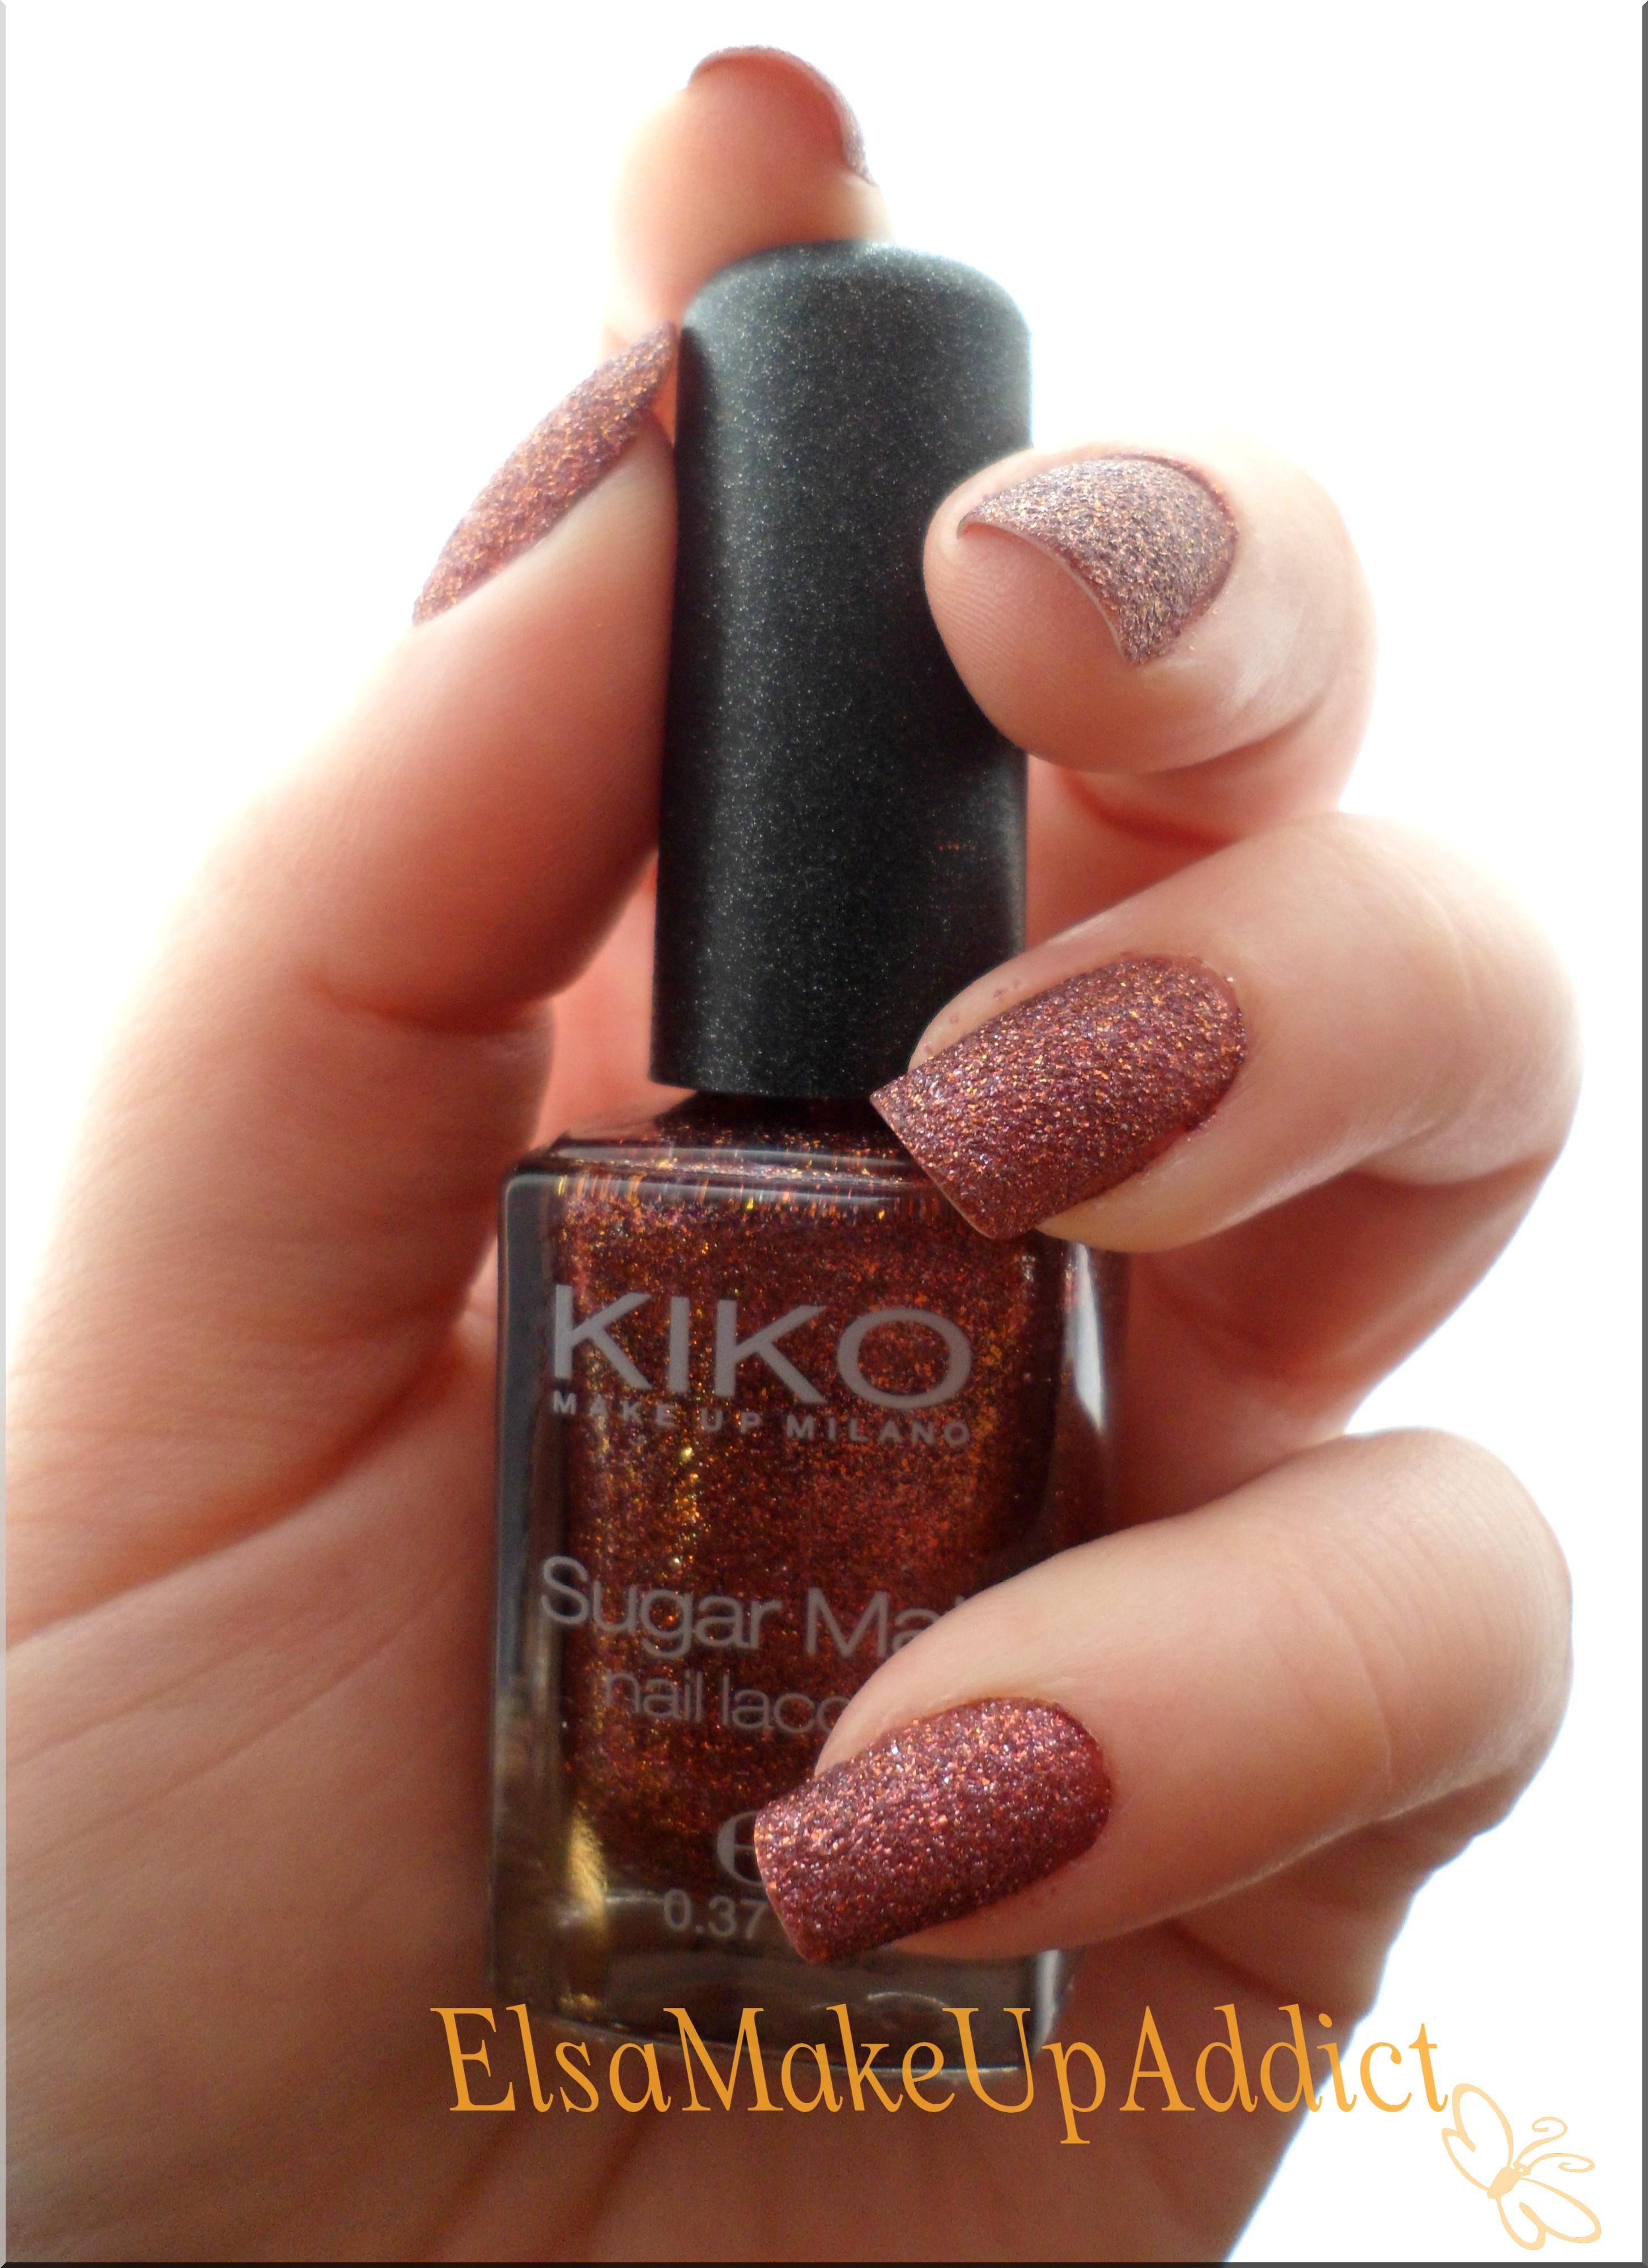 du sucre sur mes ongles avec kiko vernis sugar mat elsa makeup addict. Black Bedroom Furniture Sets. Home Design Ideas